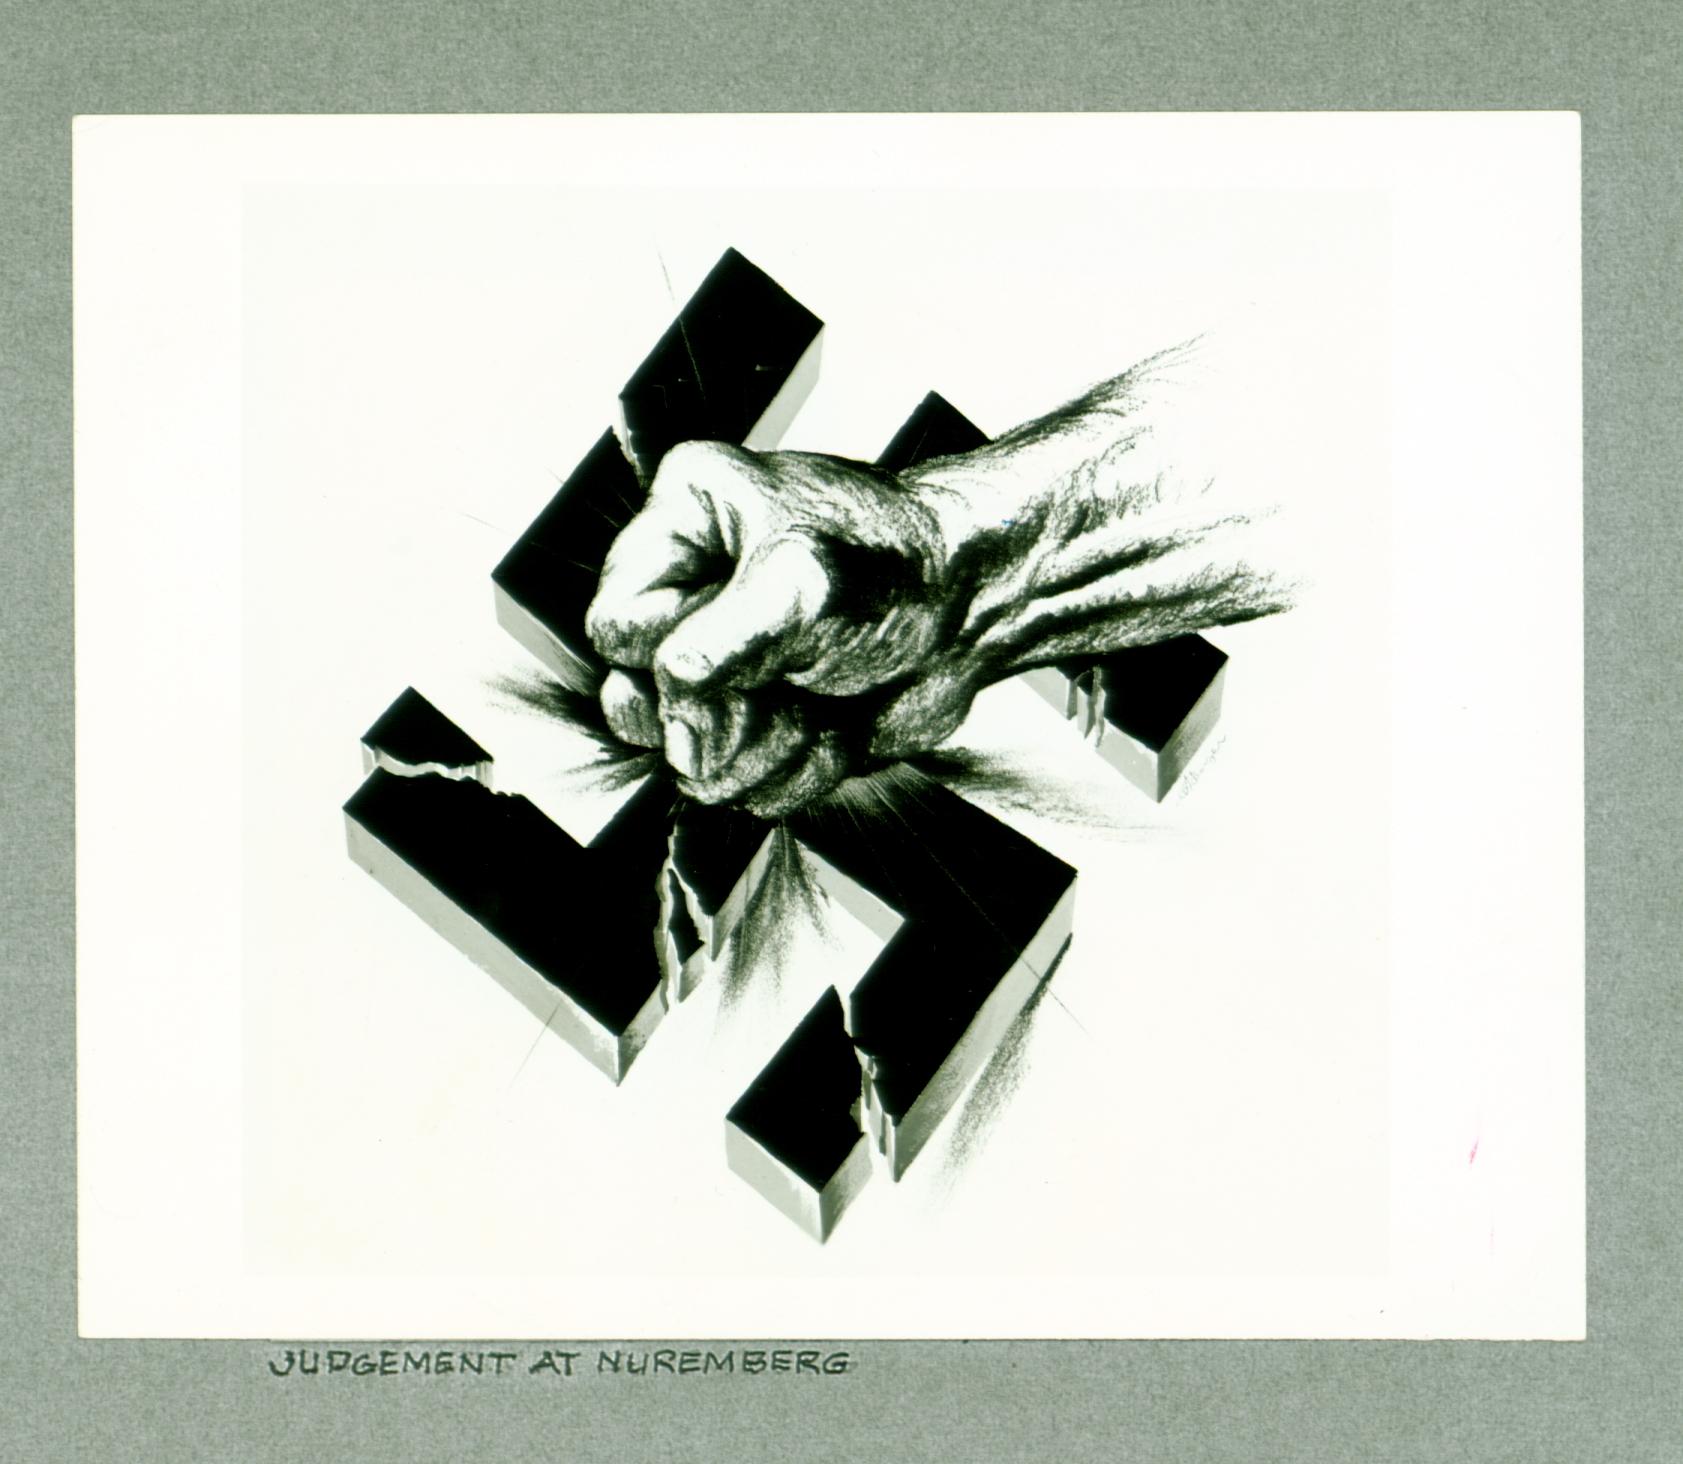 """Judgement at Nuremberg"" - 1943-1945"